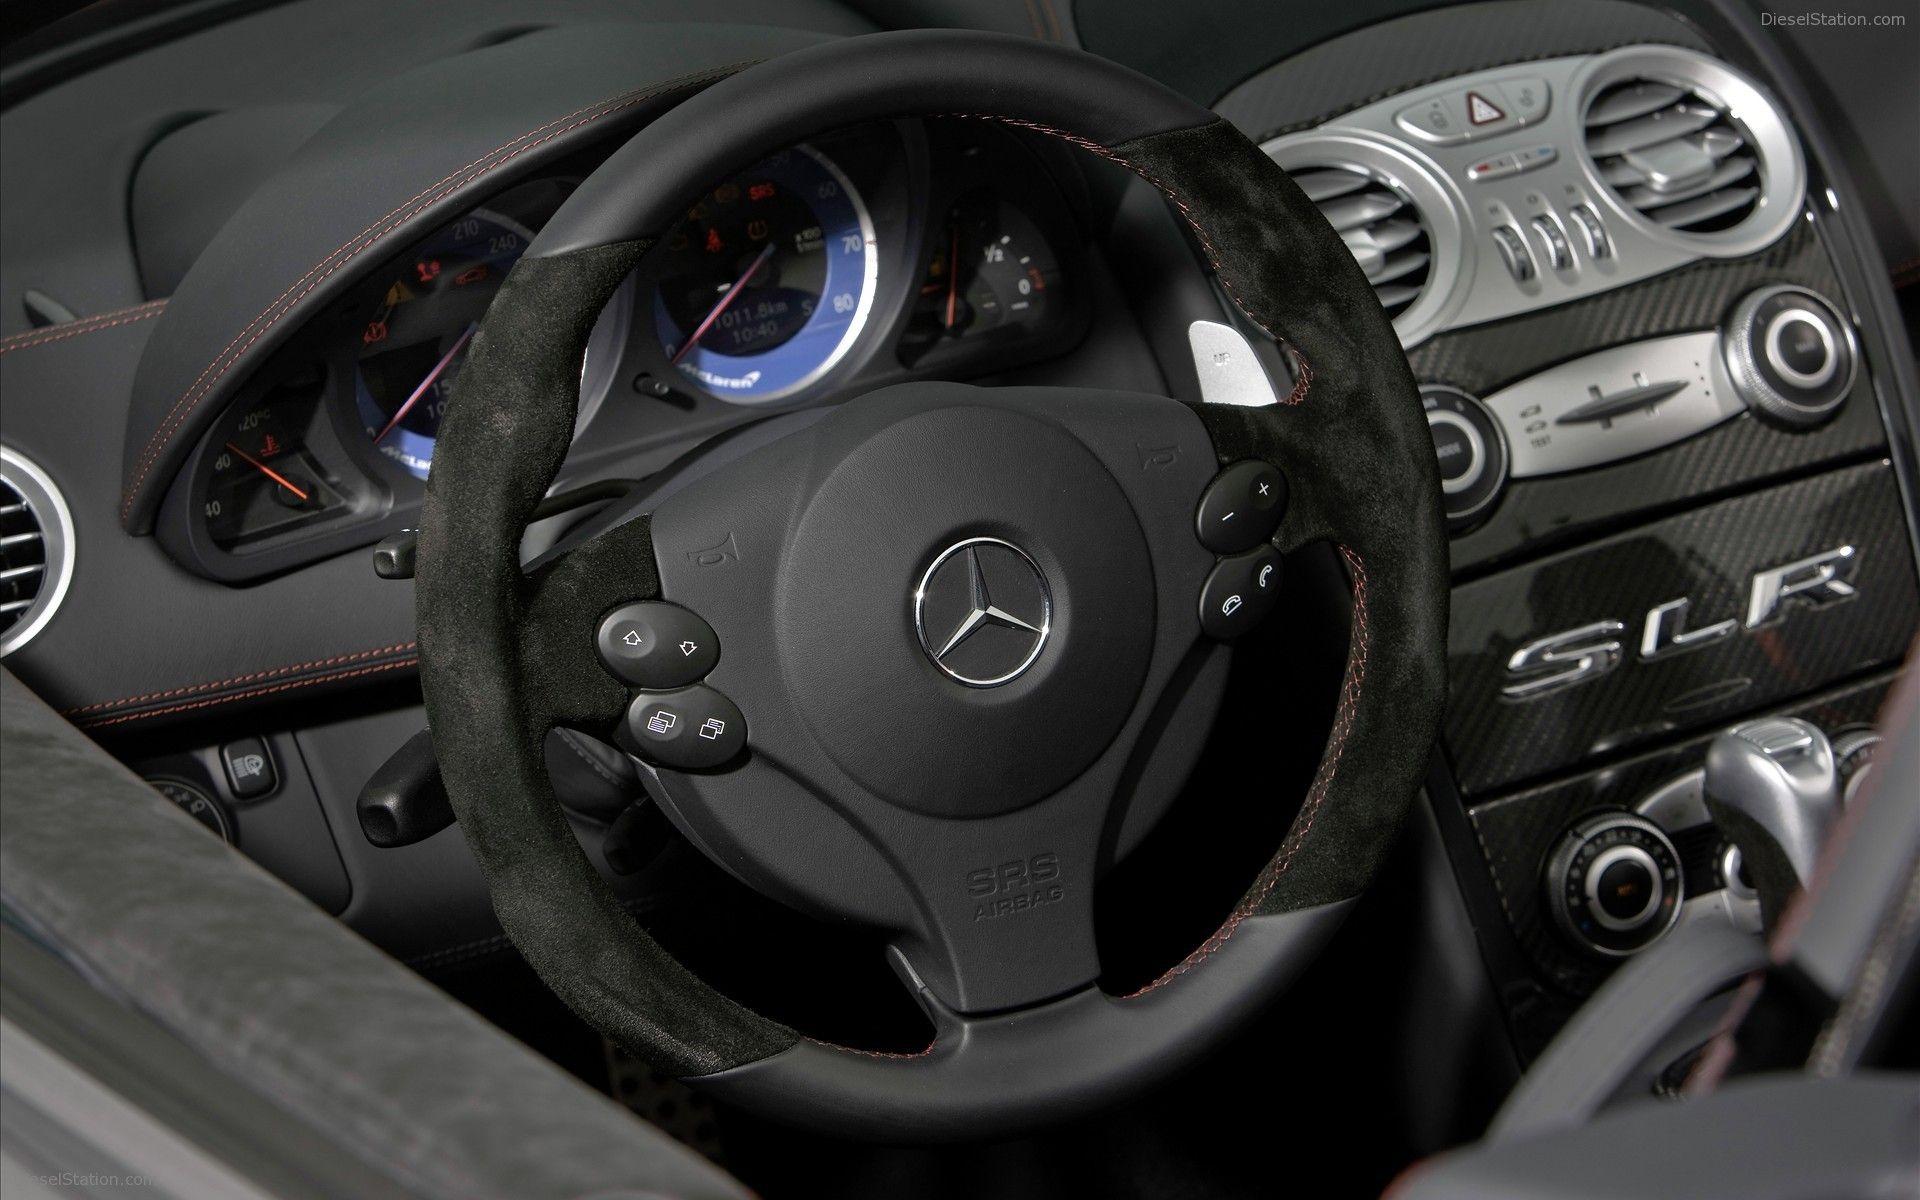 2009 Mercedes Benz Slr Mclaren Roadster 722 S Slr Mclaren